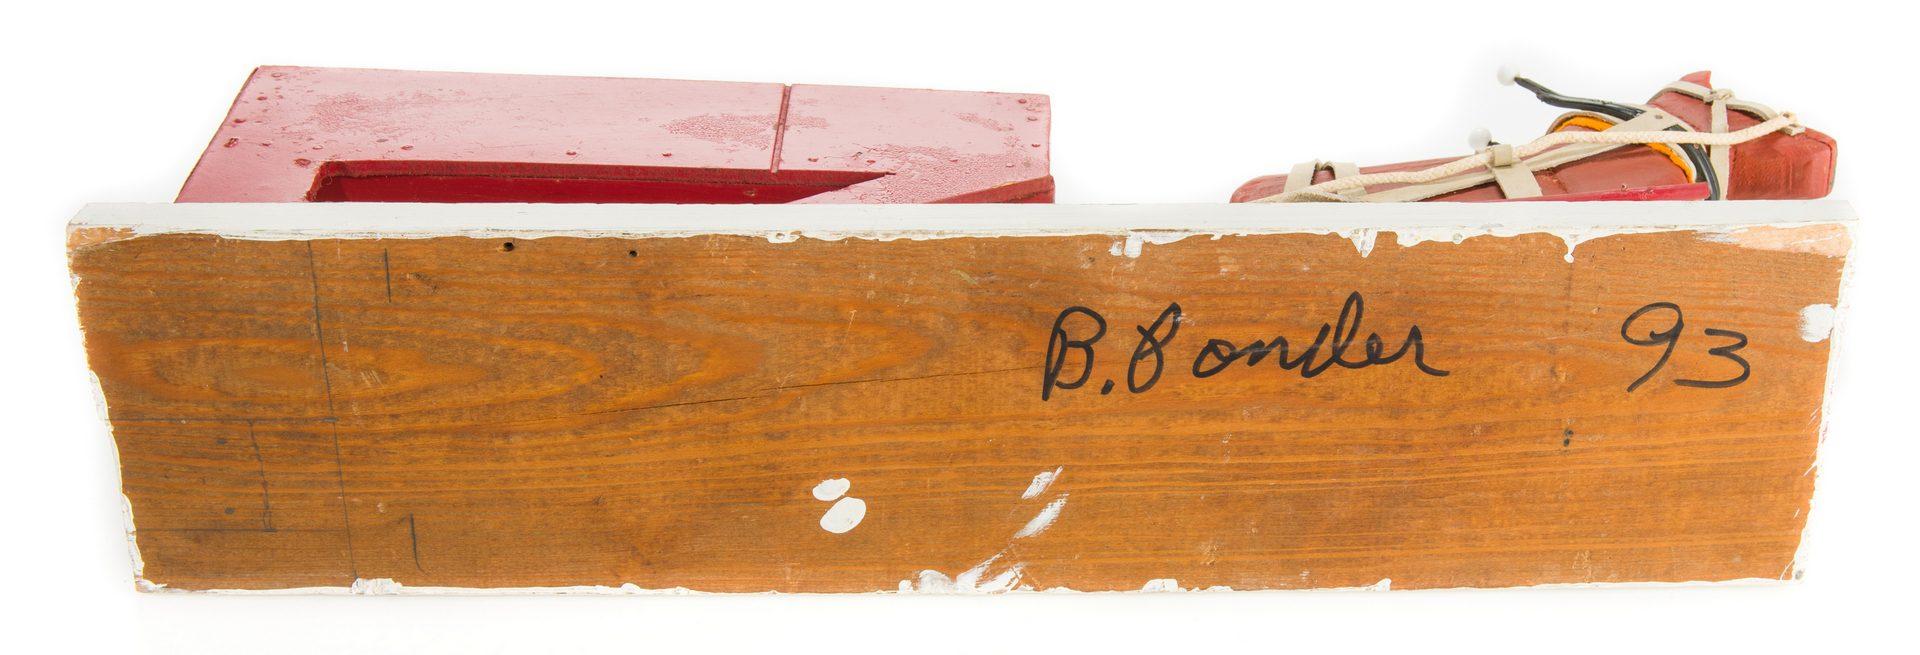 Lot 358: 6 Braxton Ponder Carvings